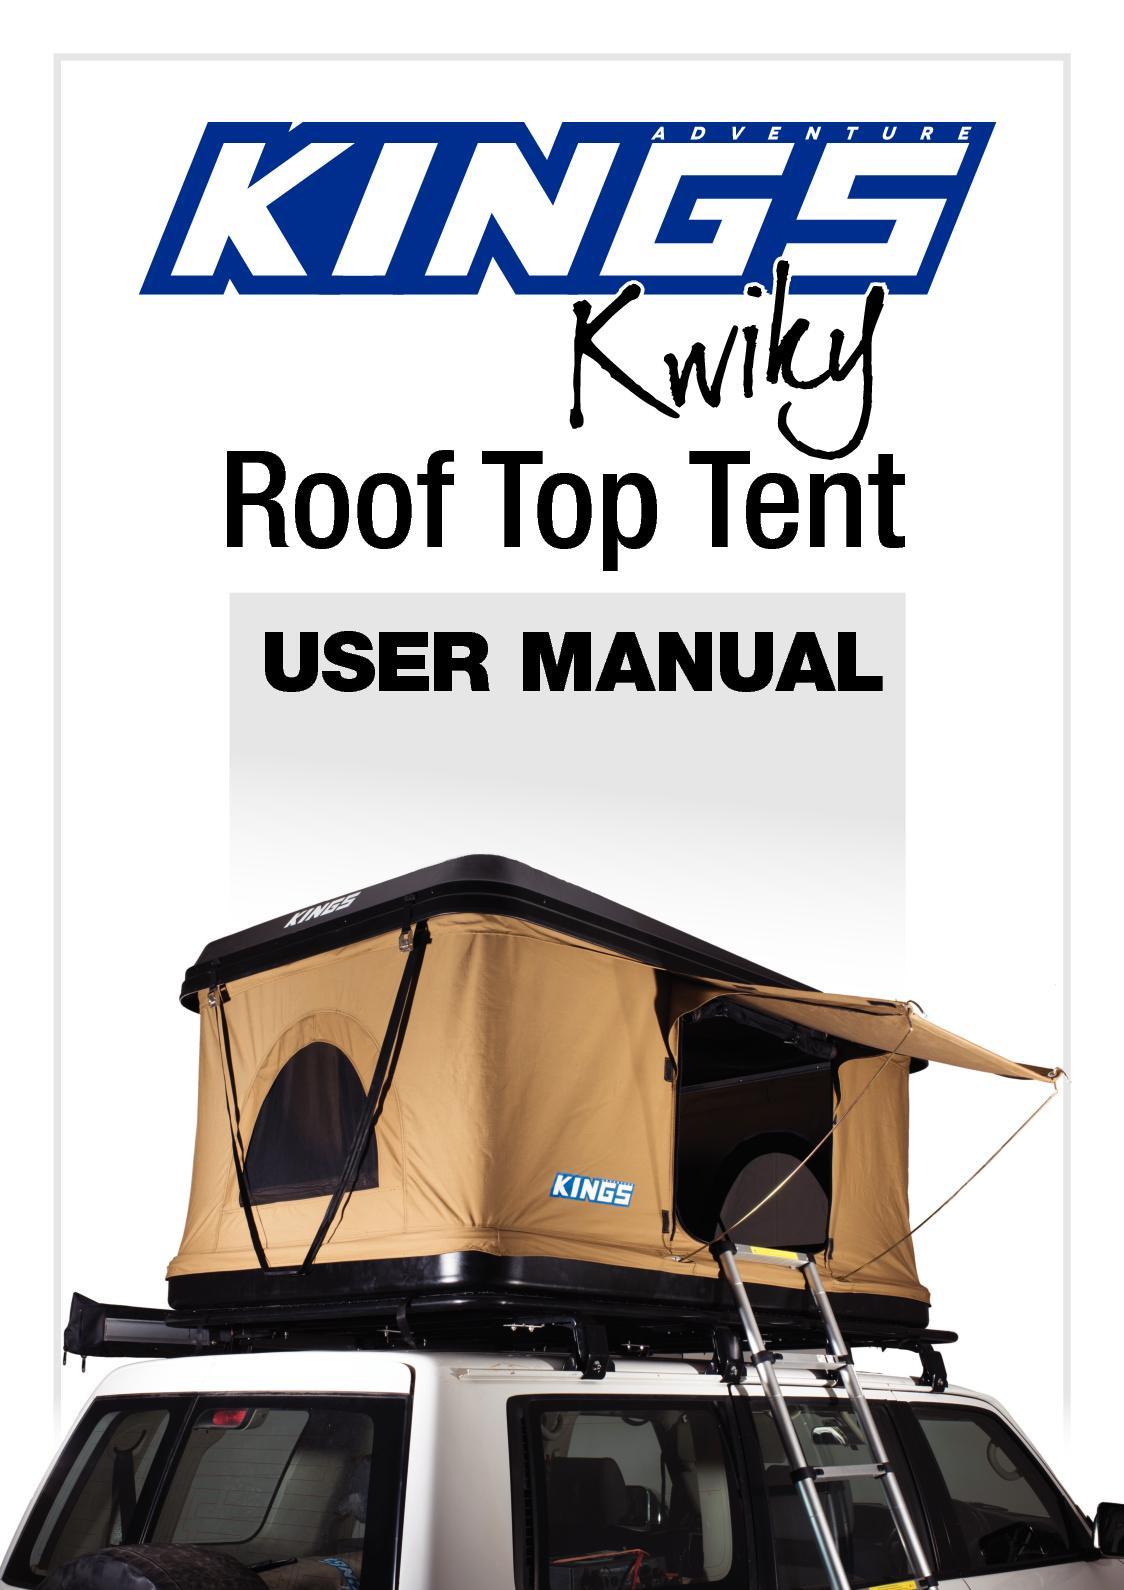 4Wd Supacentre Roof Rack Installation calaméo - akta rtta kwiky